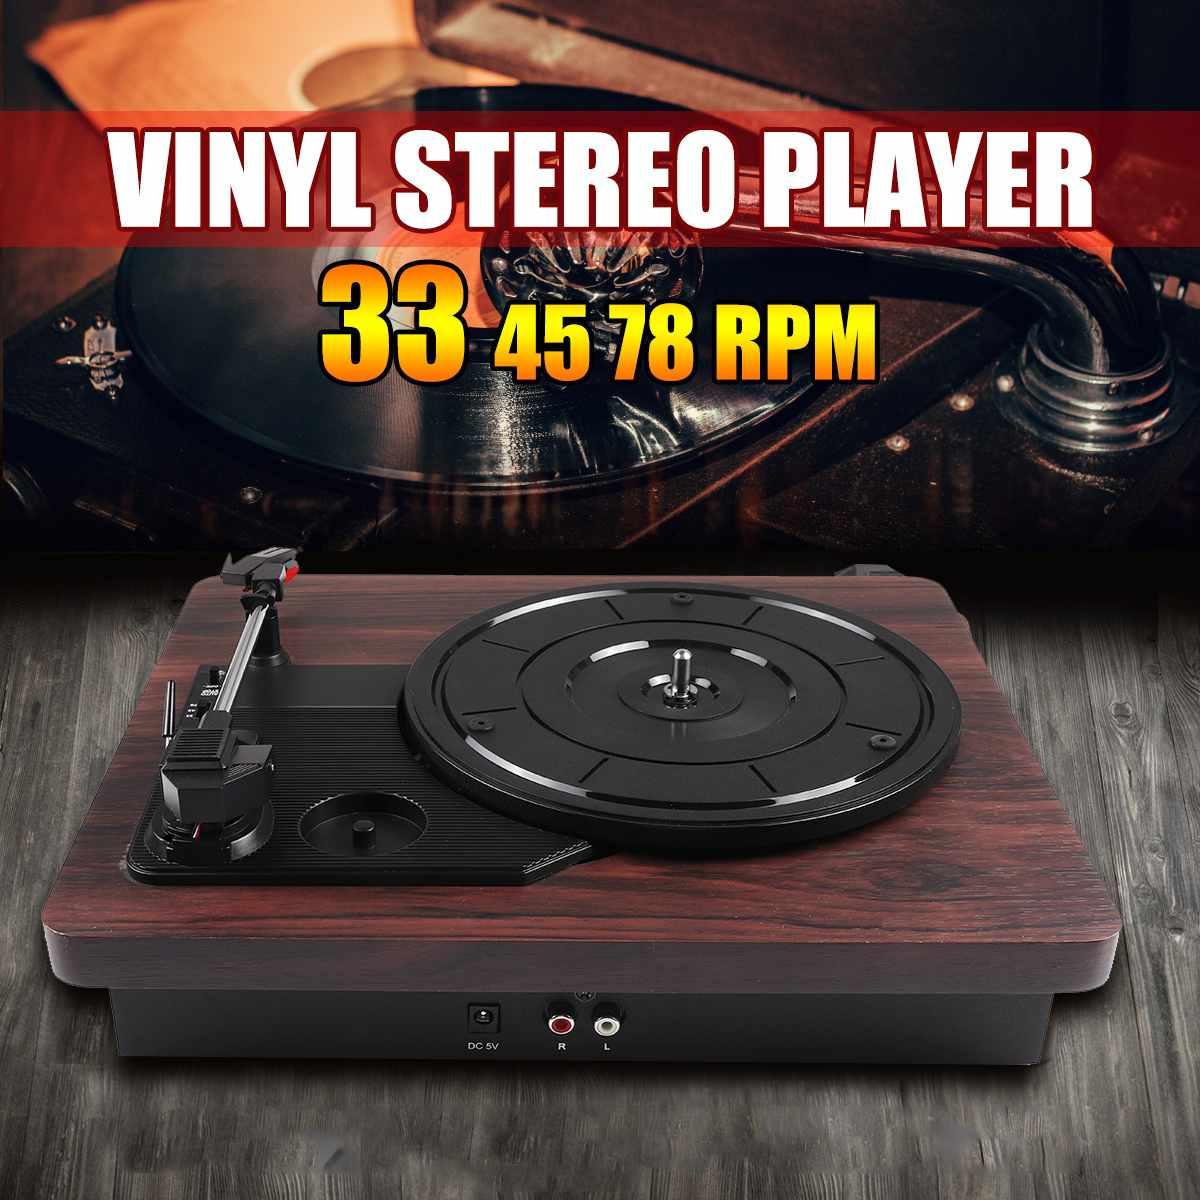 DC 5V Retro Stereo 33 45 78 RPM LP Three Speed Vinyl Record-Turntable Player Gramophone RCA R/L 3.5mm